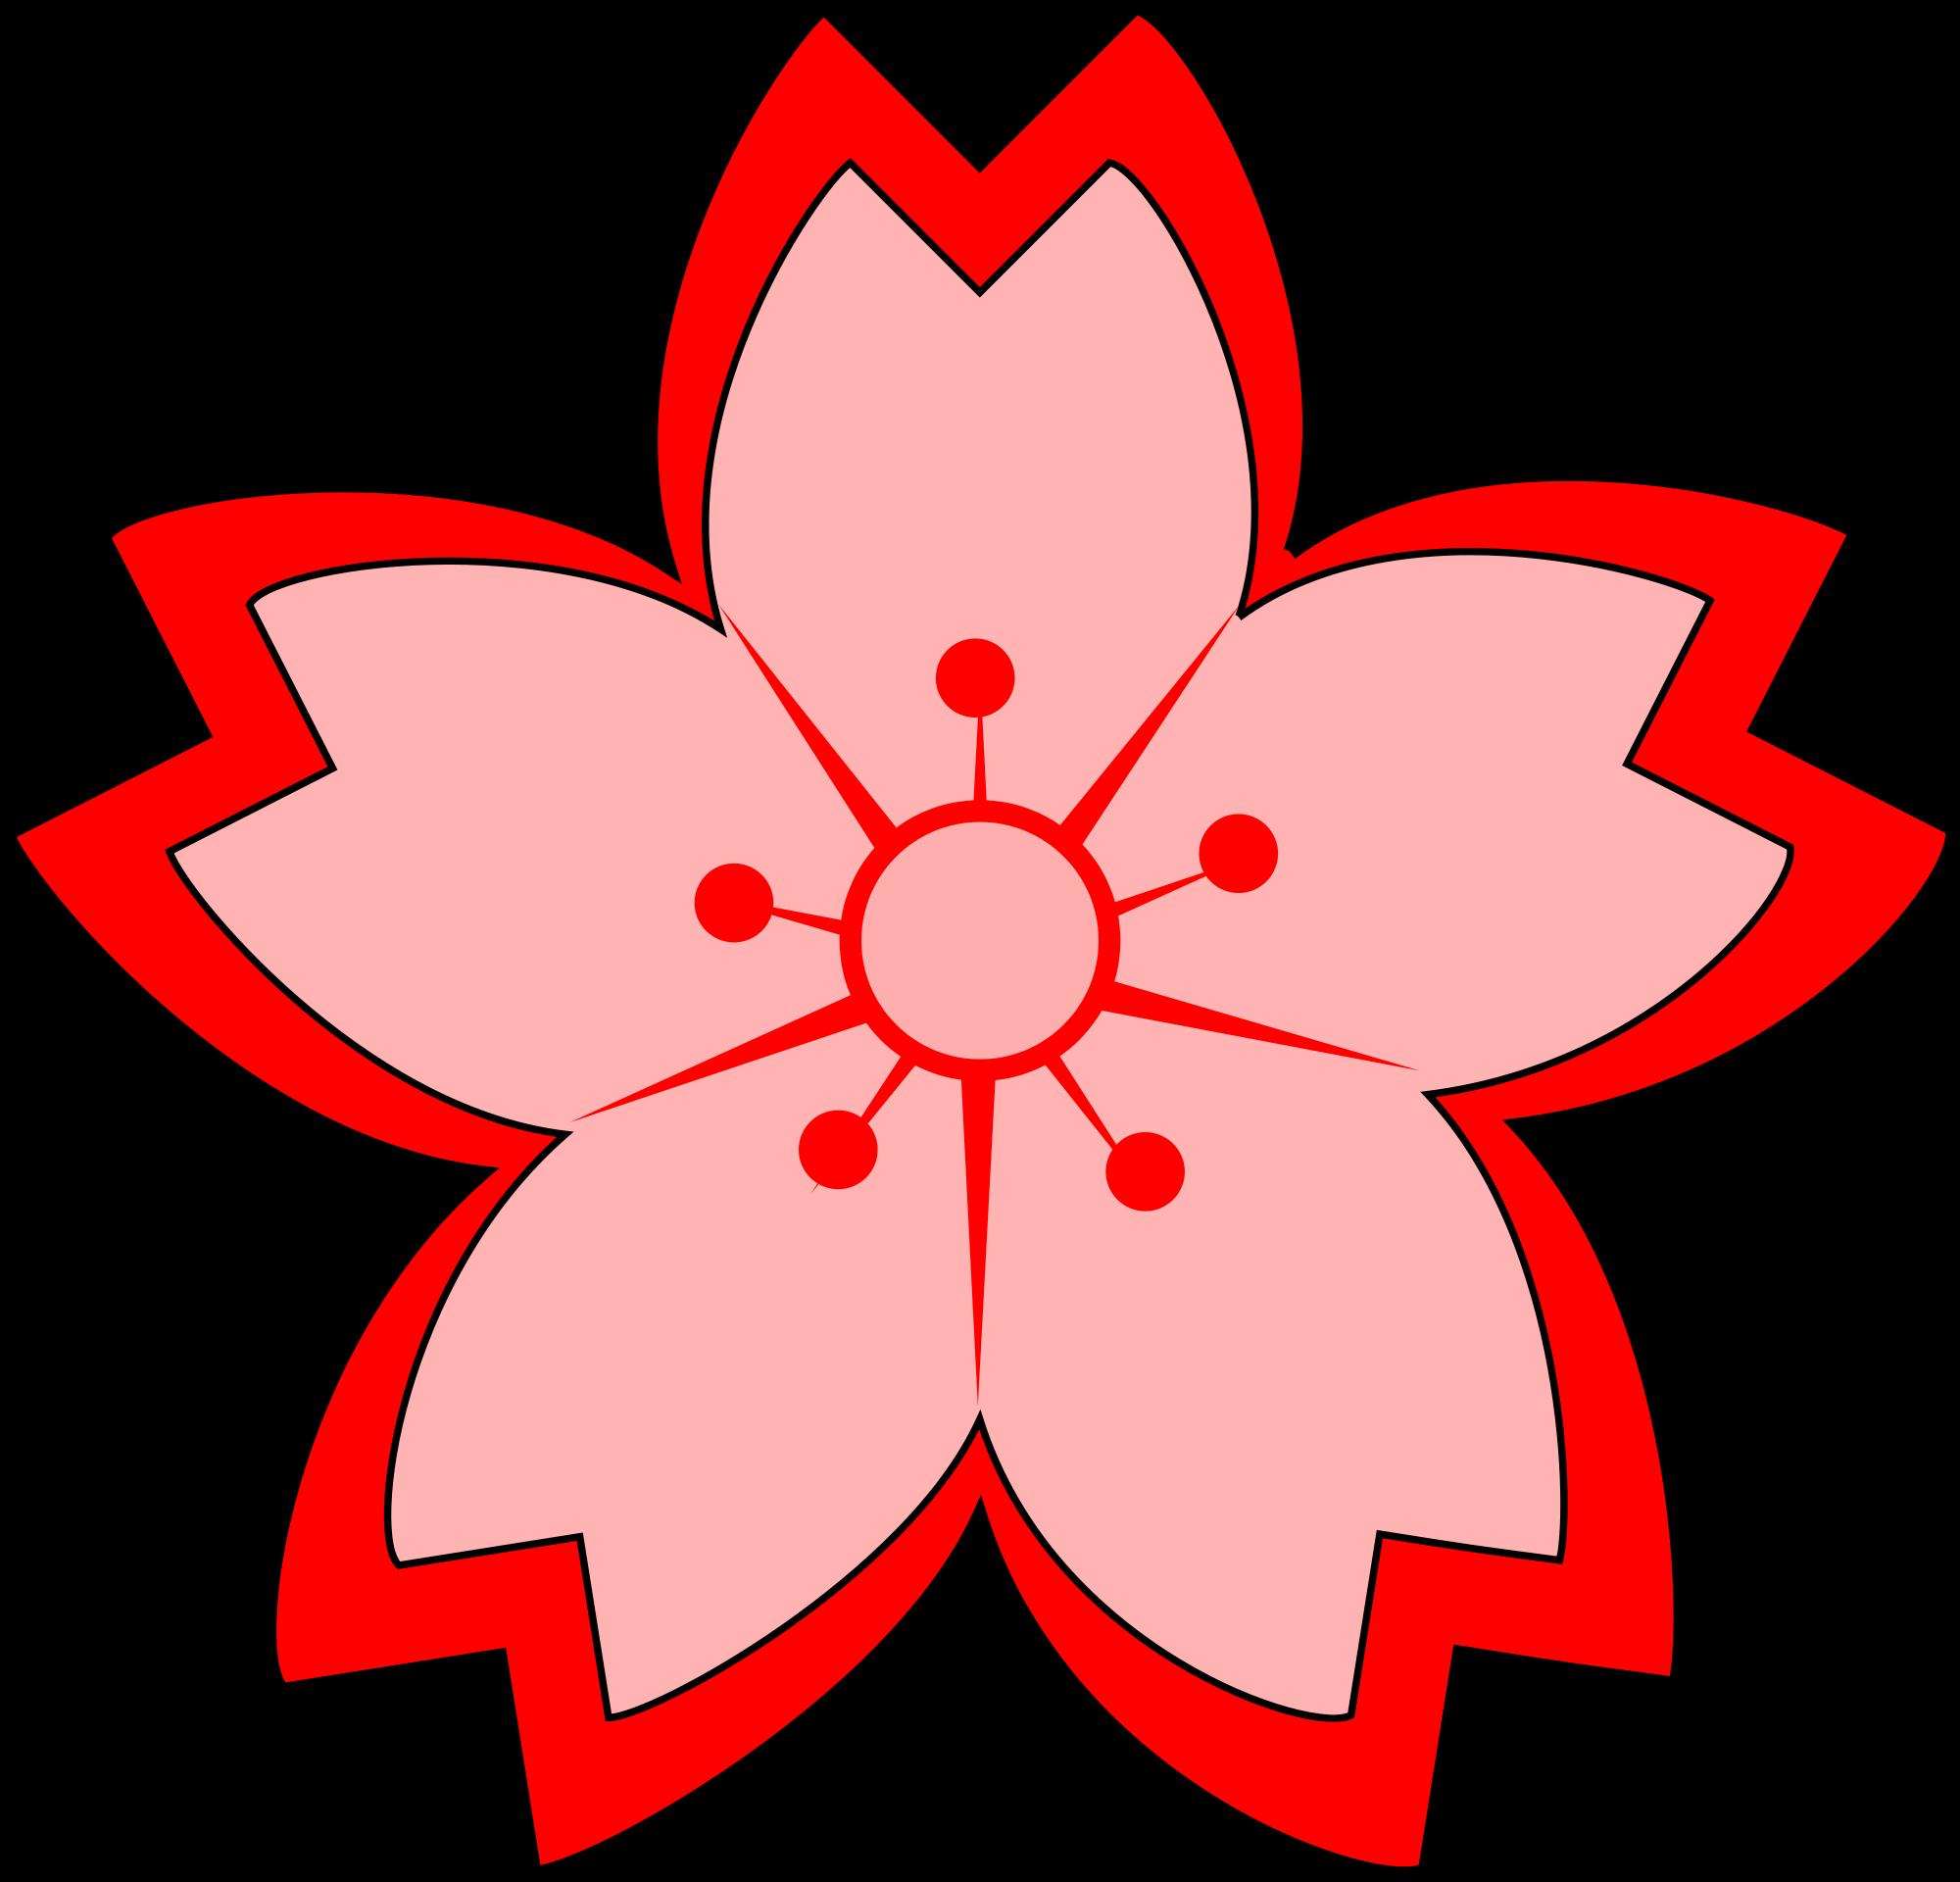 Sakura Blossom svg #12, Download drawings